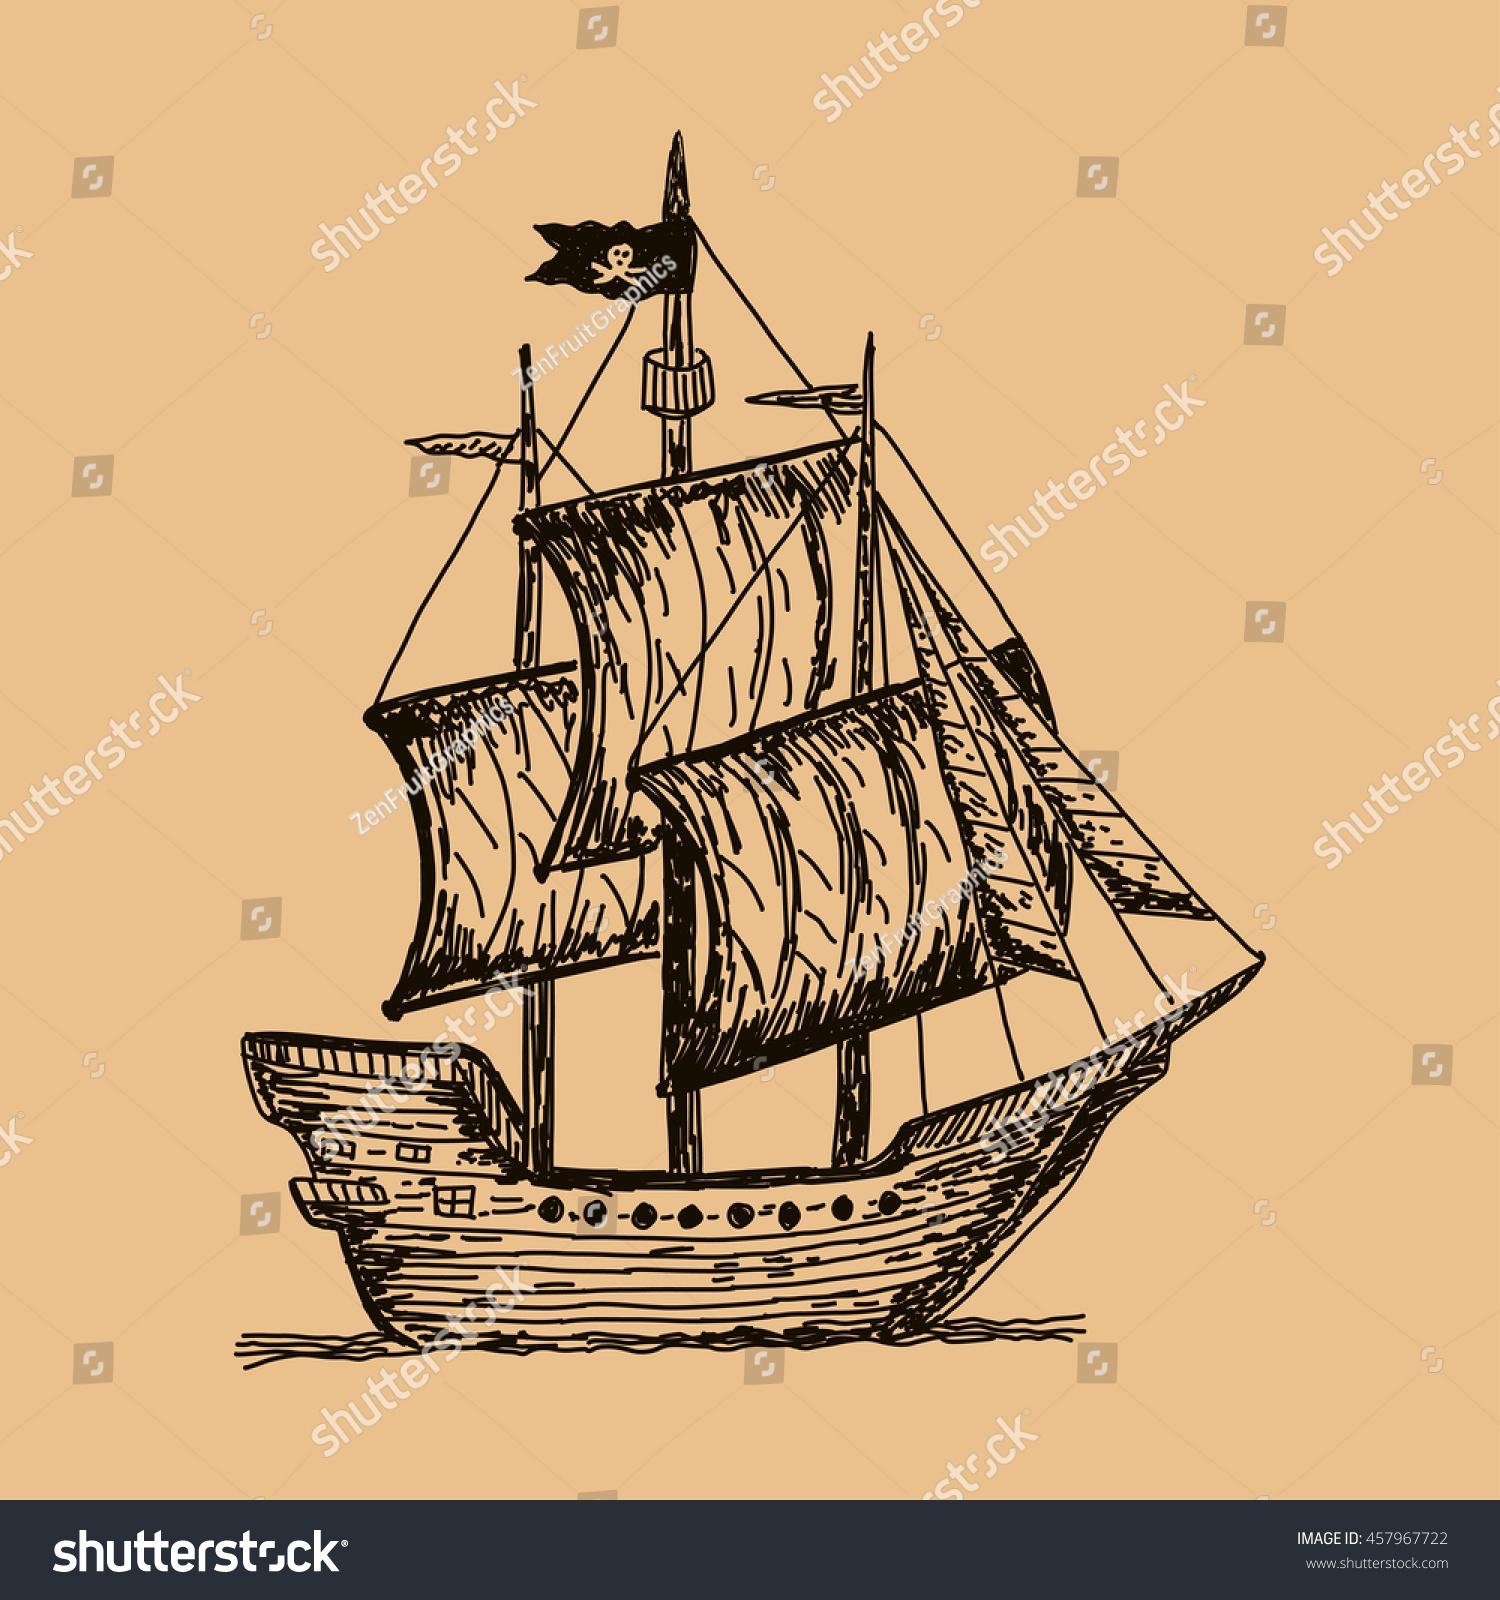 ship drawing paper - photo #5